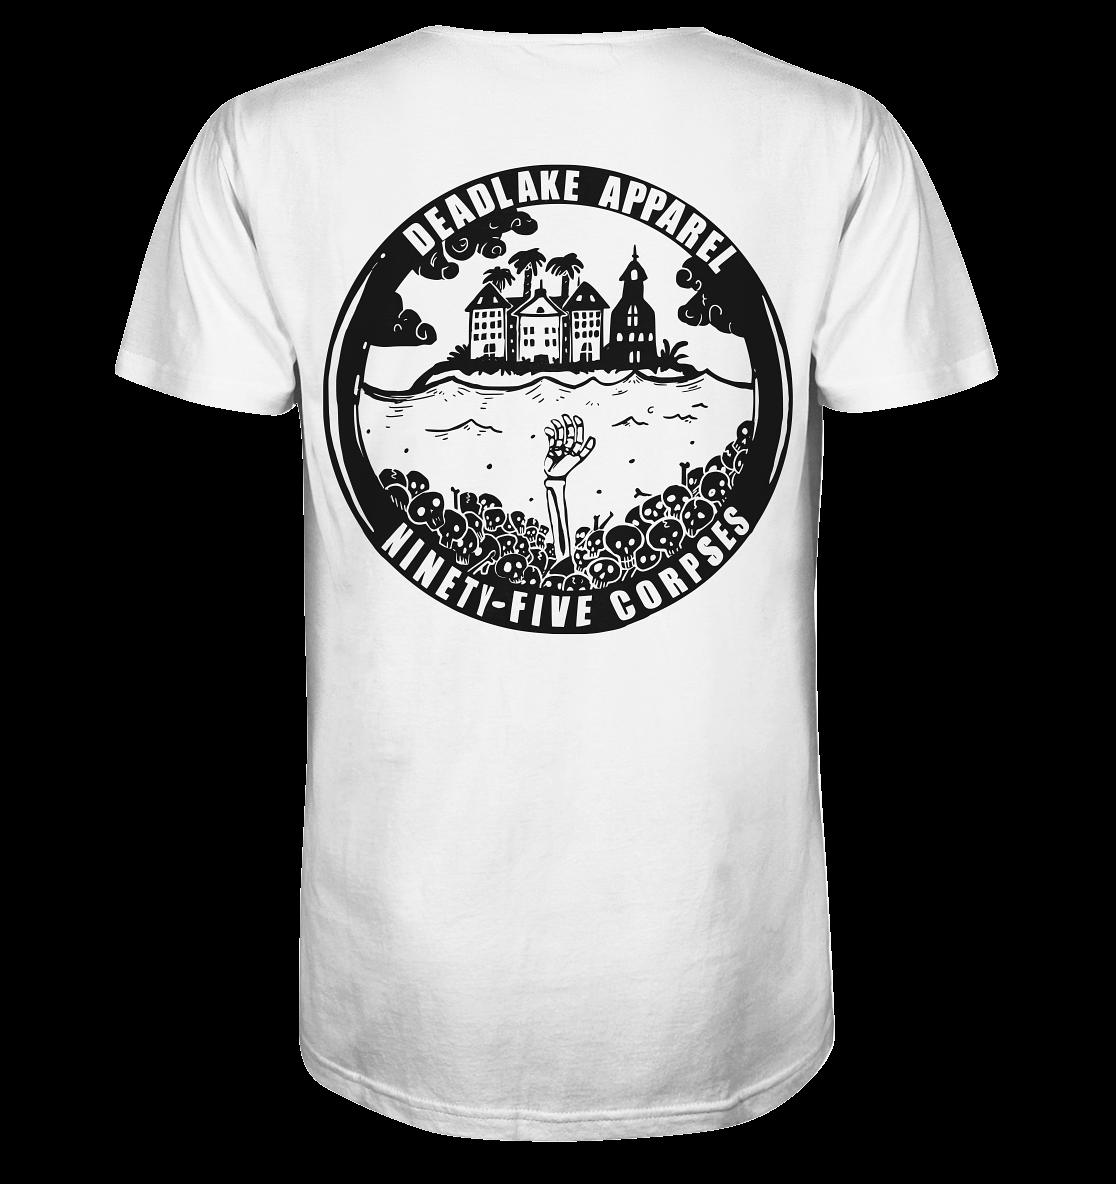 back-organic-shirt-f8f8f8-1116x.png